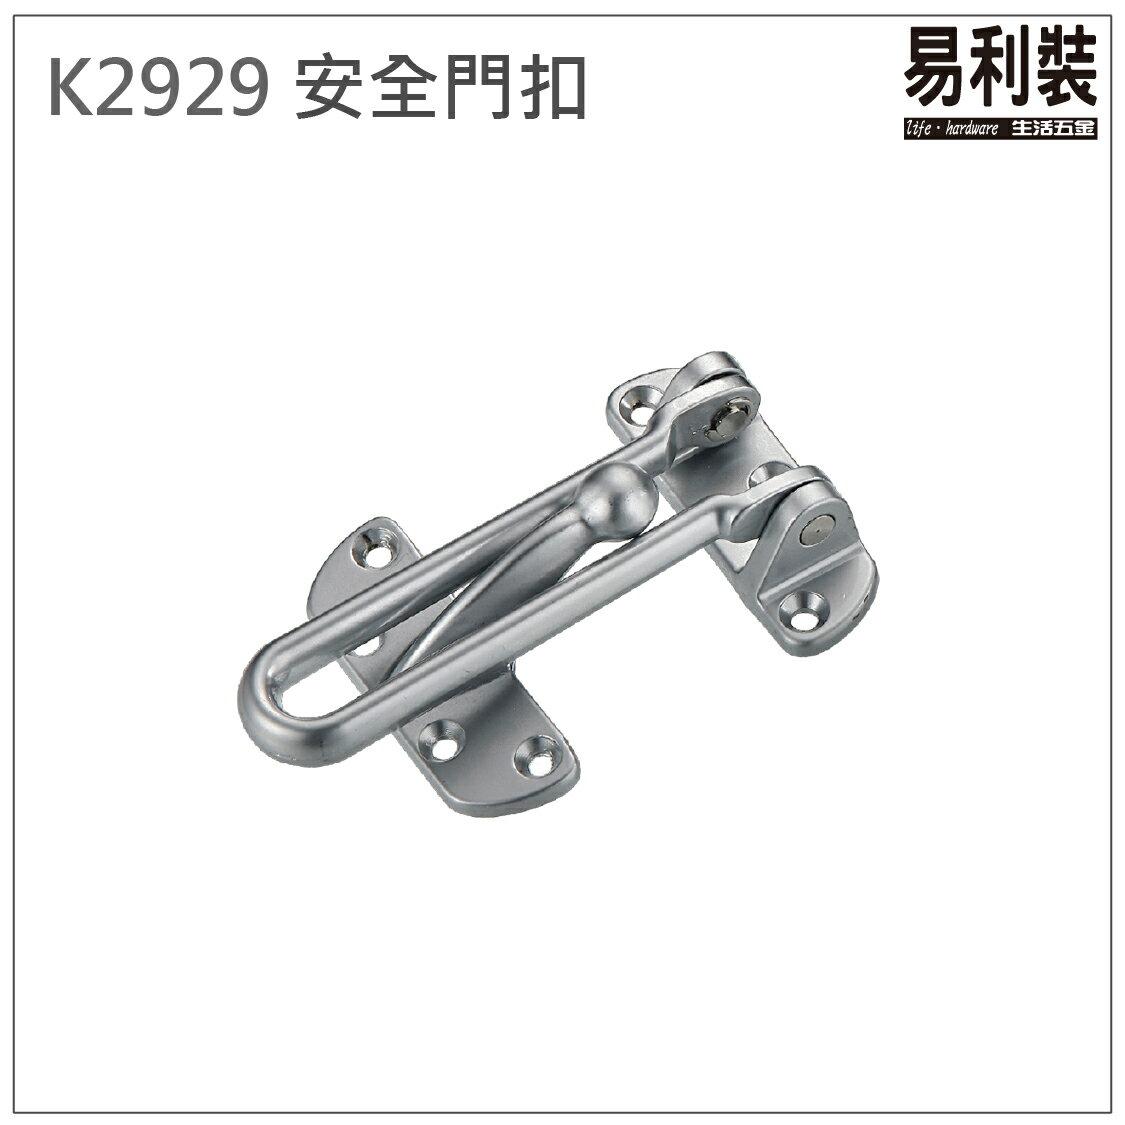 K2929 安全門扣  易利裝生活五金 安全鎖 0